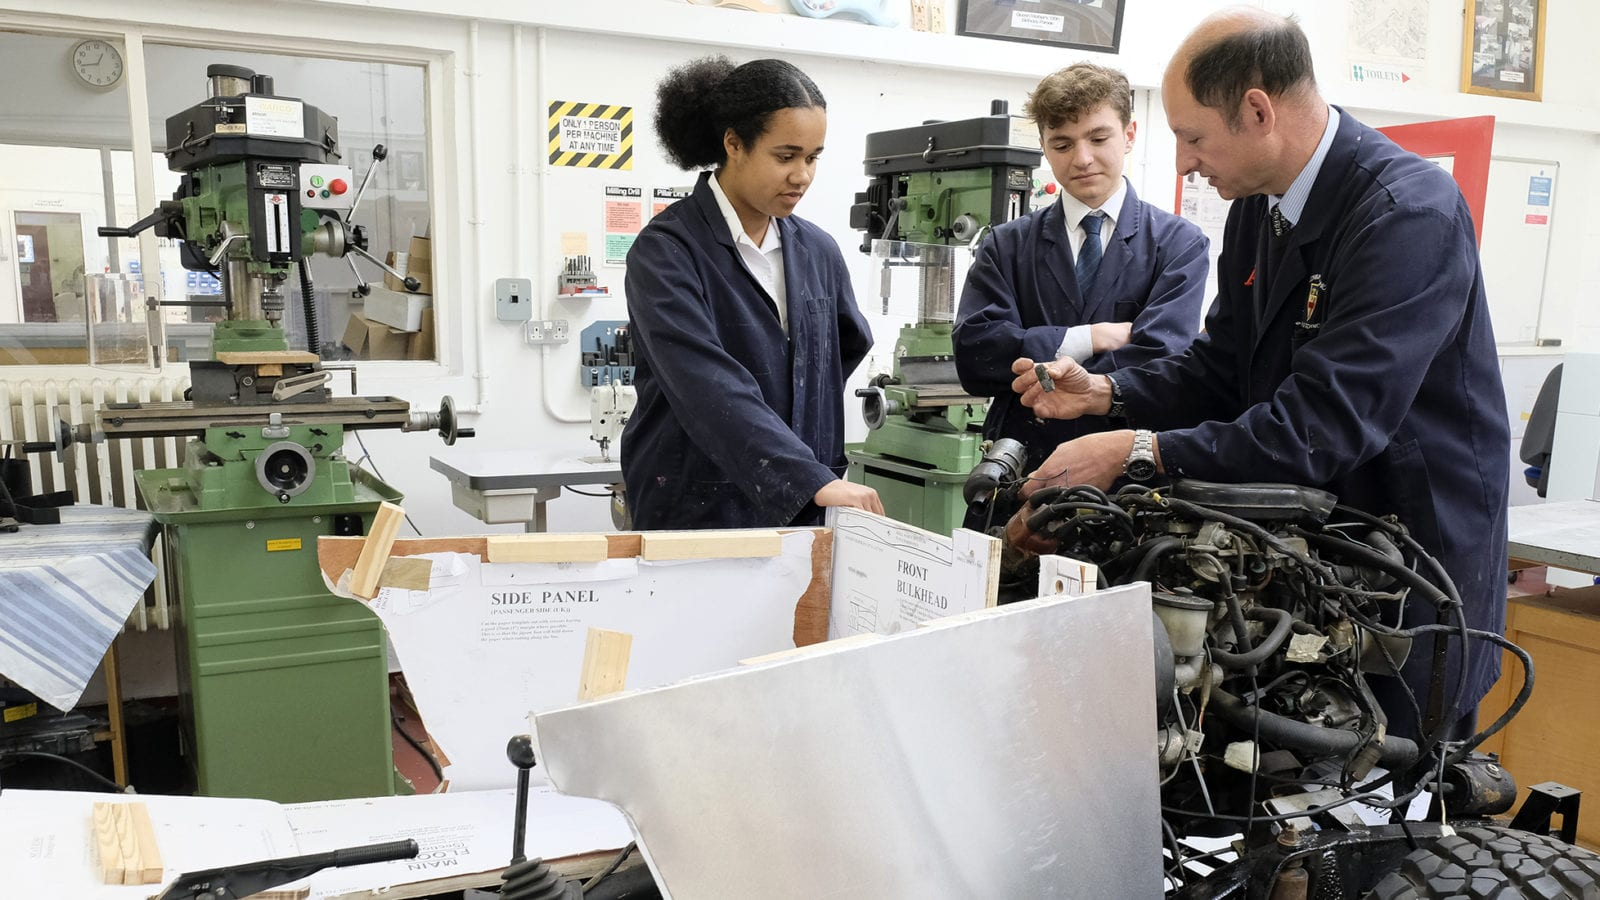 International Schools UK